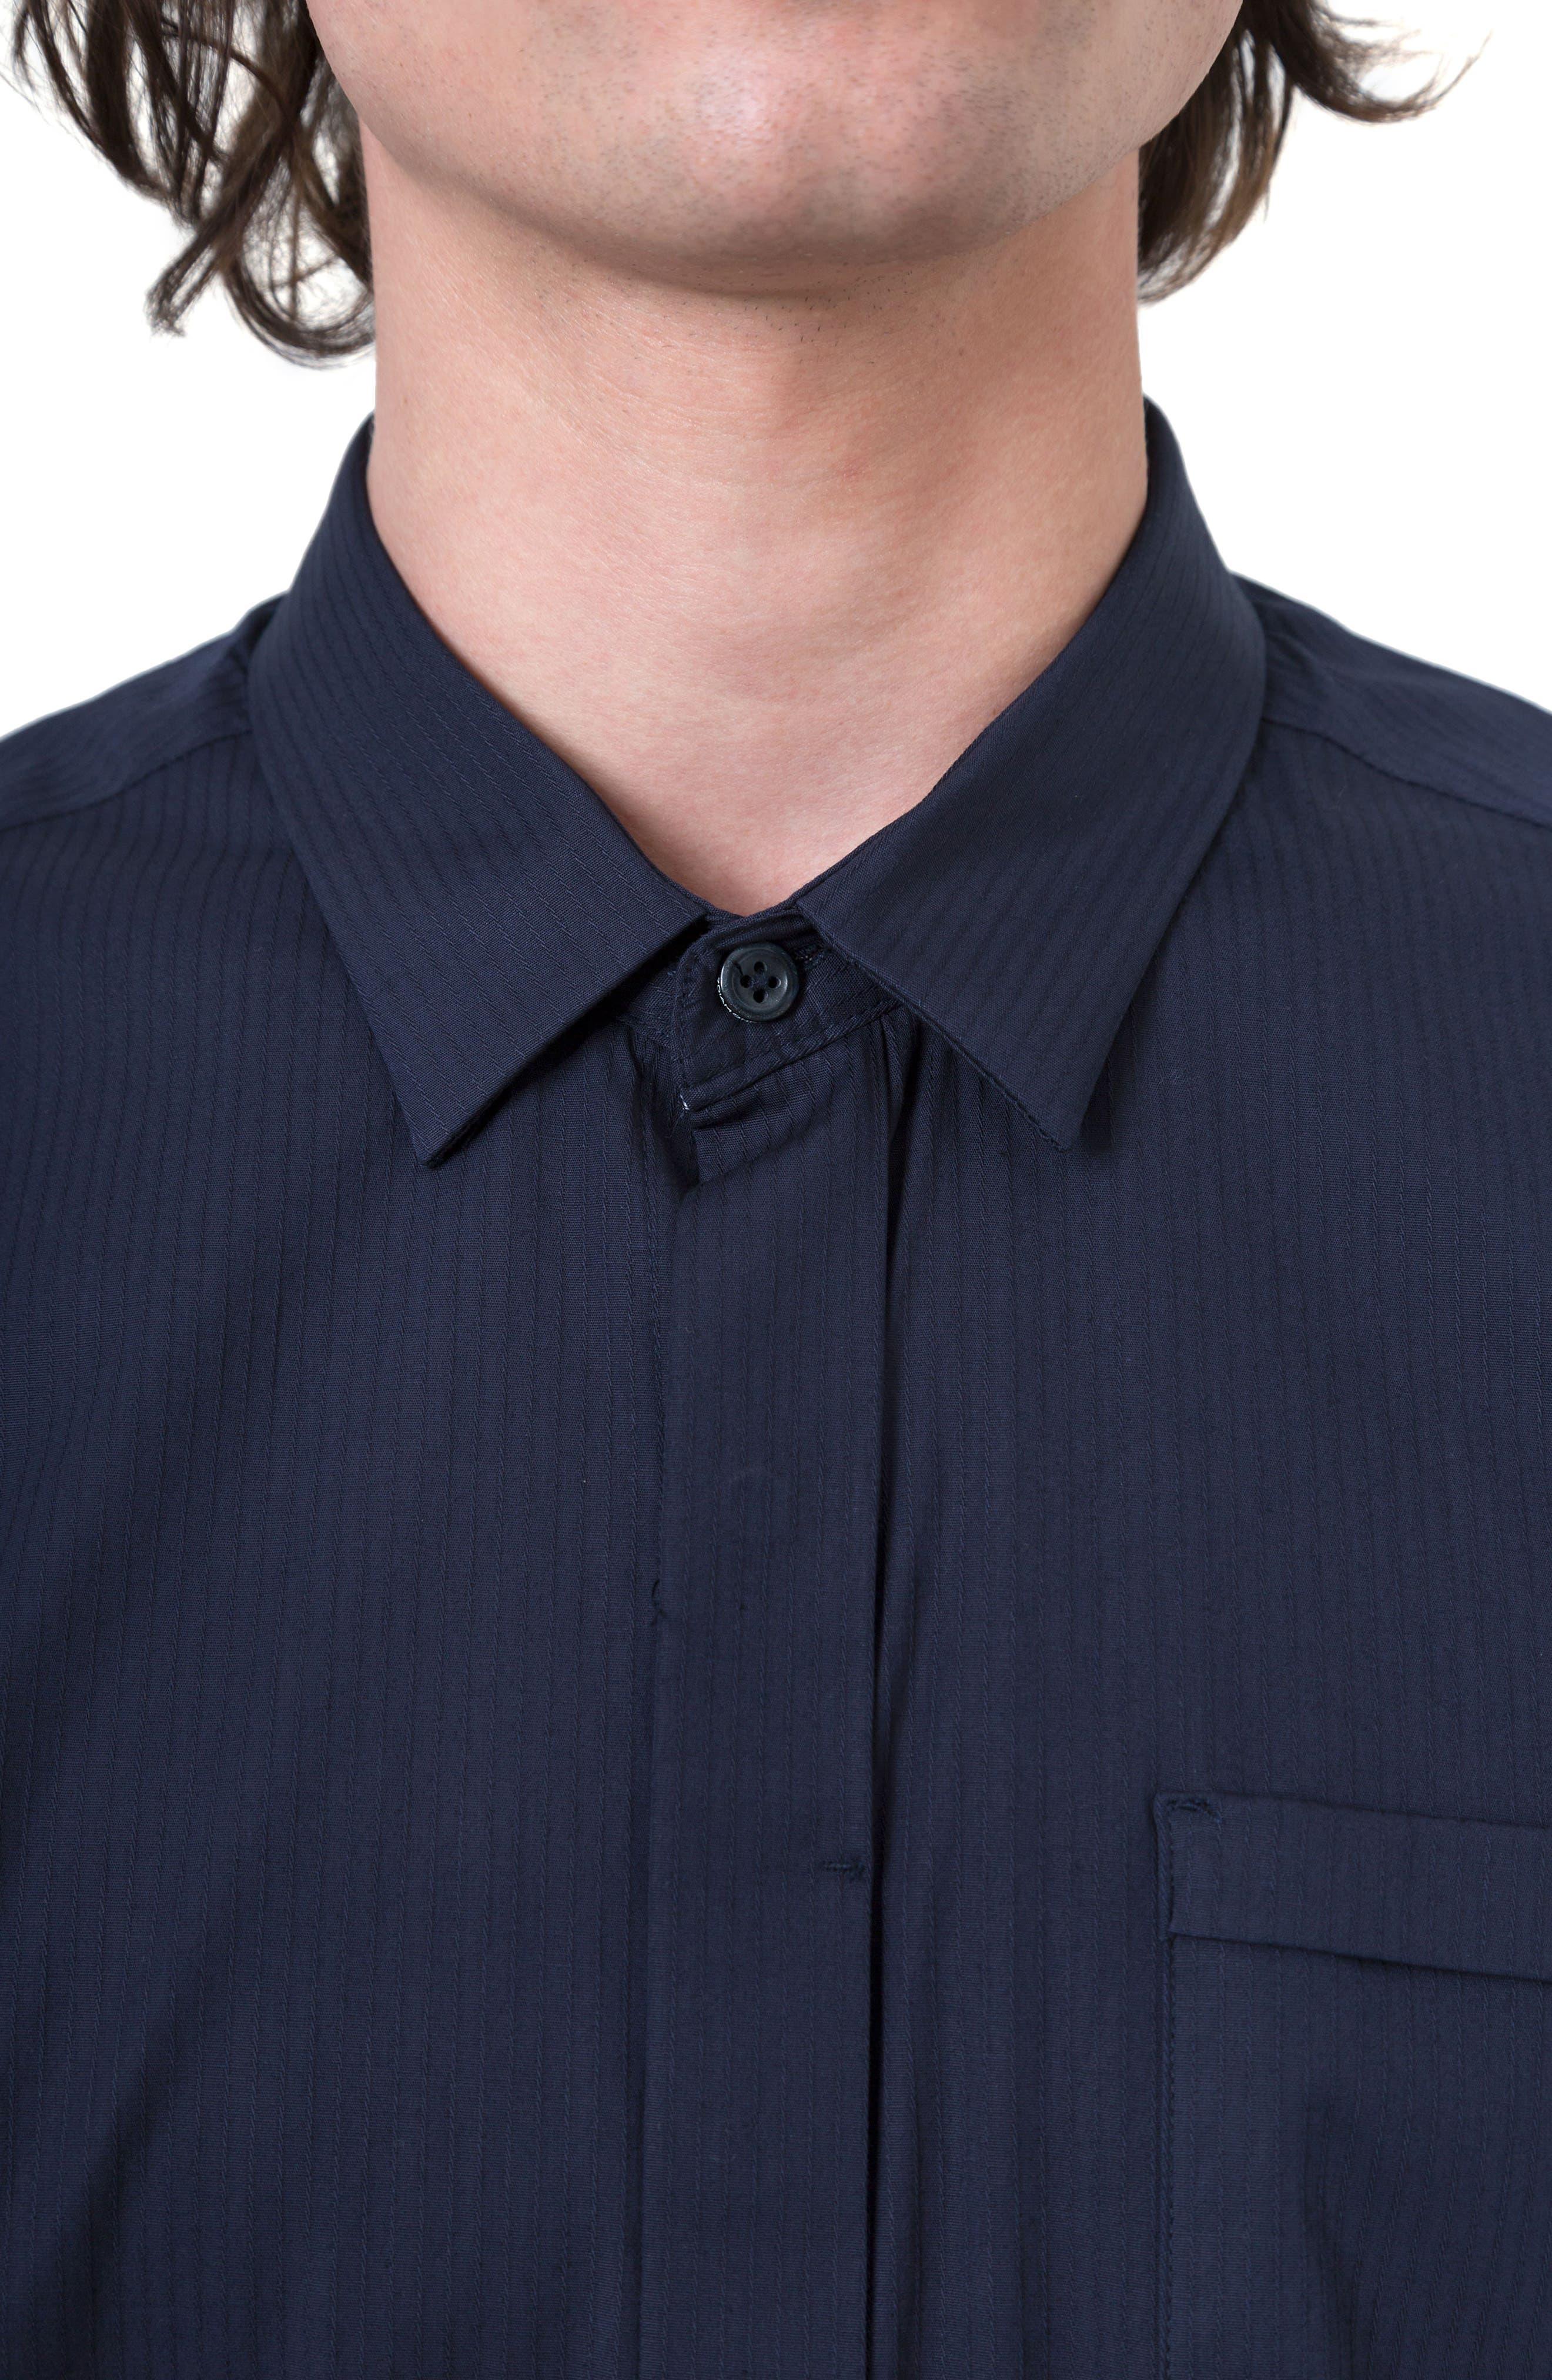 City Savior Woven Shirt,                             Alternate thumbnail 4, color,                             Navy